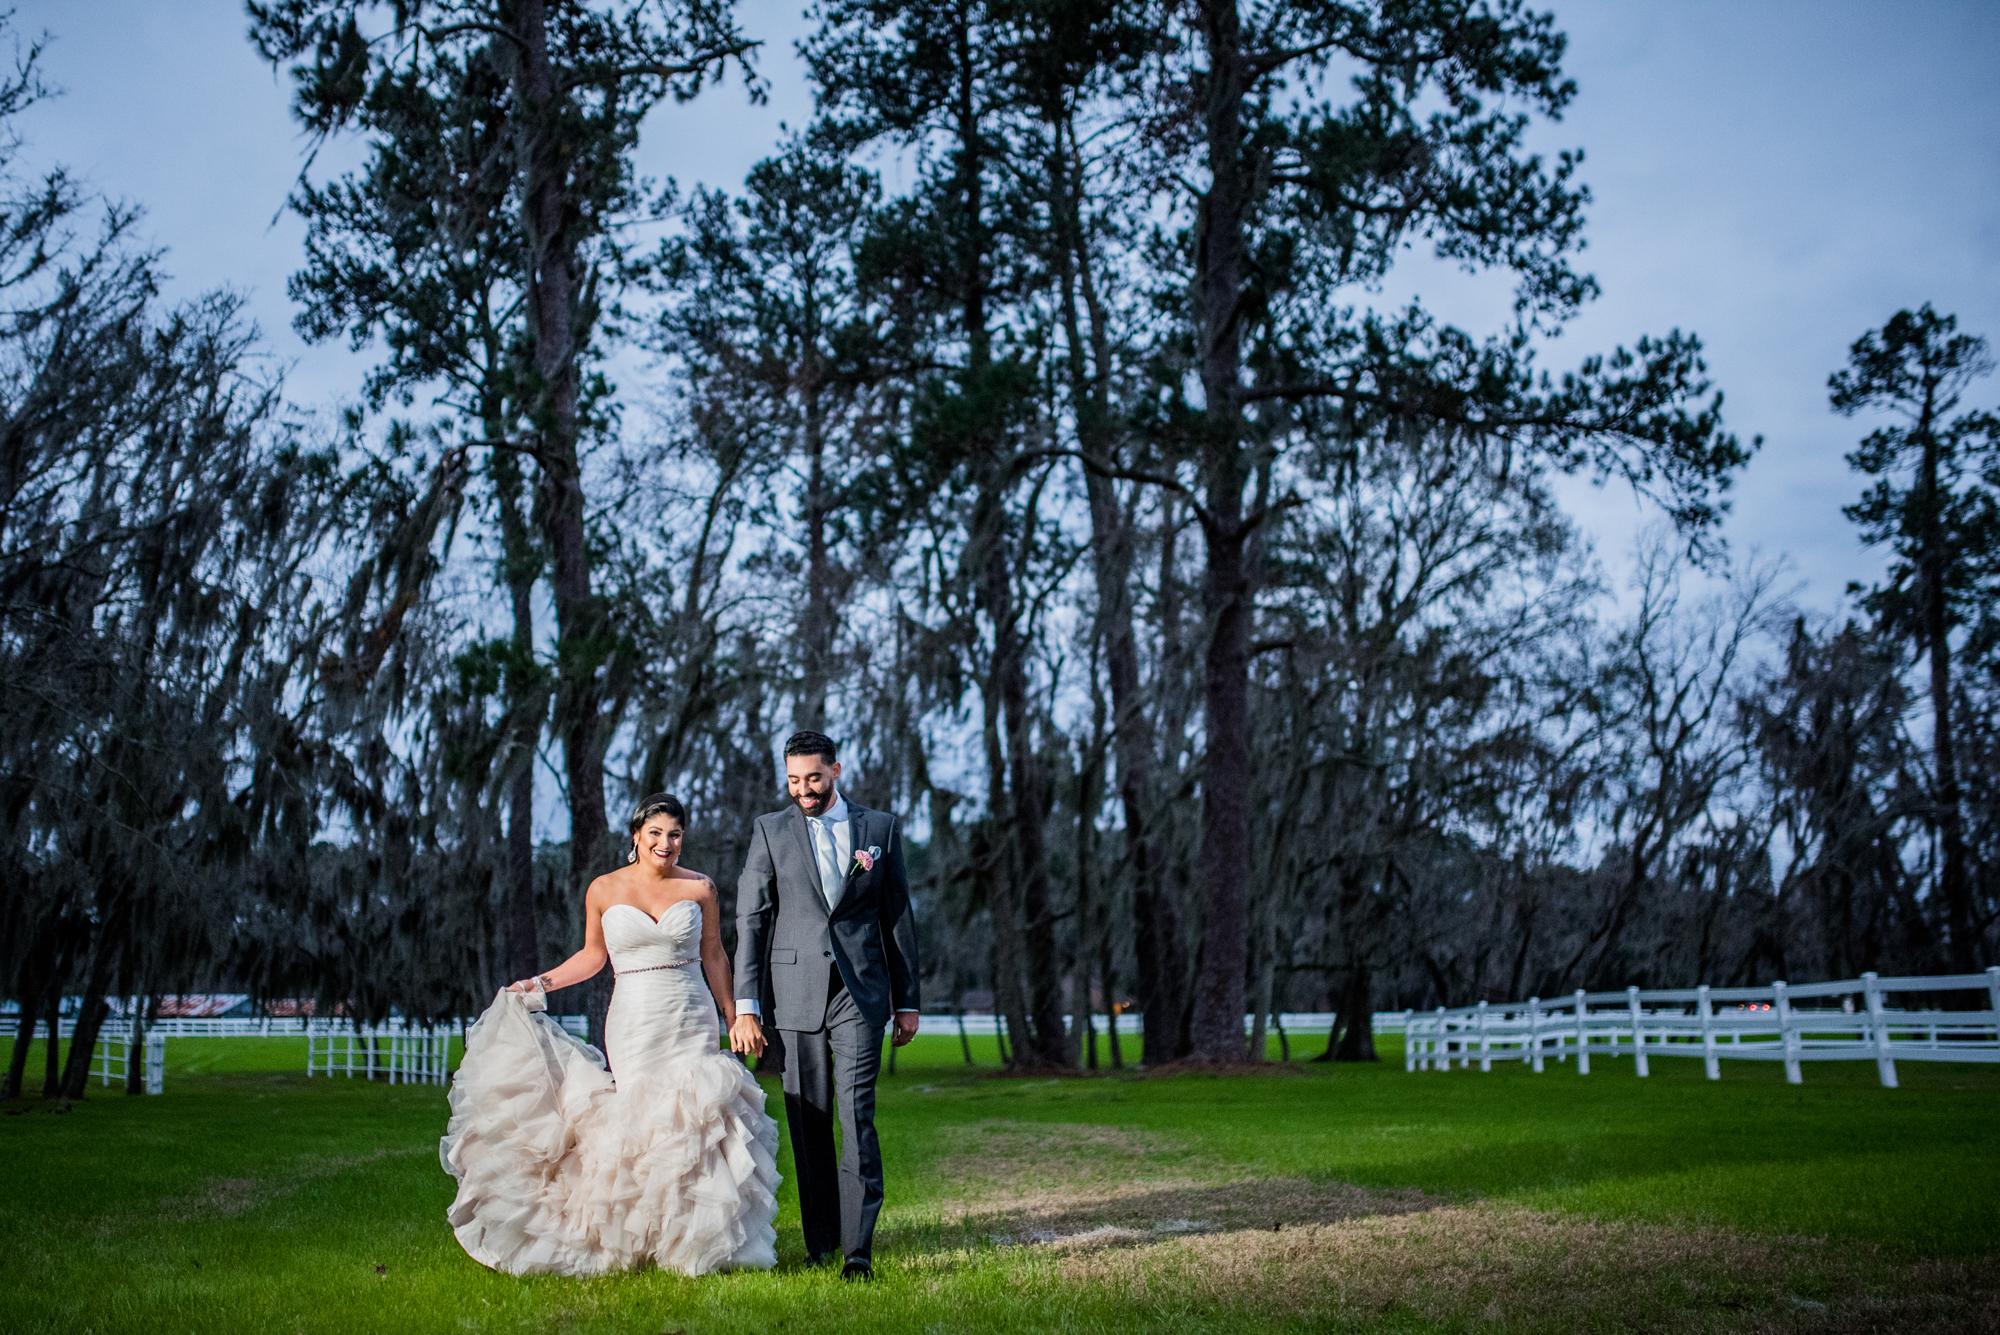 Romantic Upscale Barn Wedding The Celebration Society